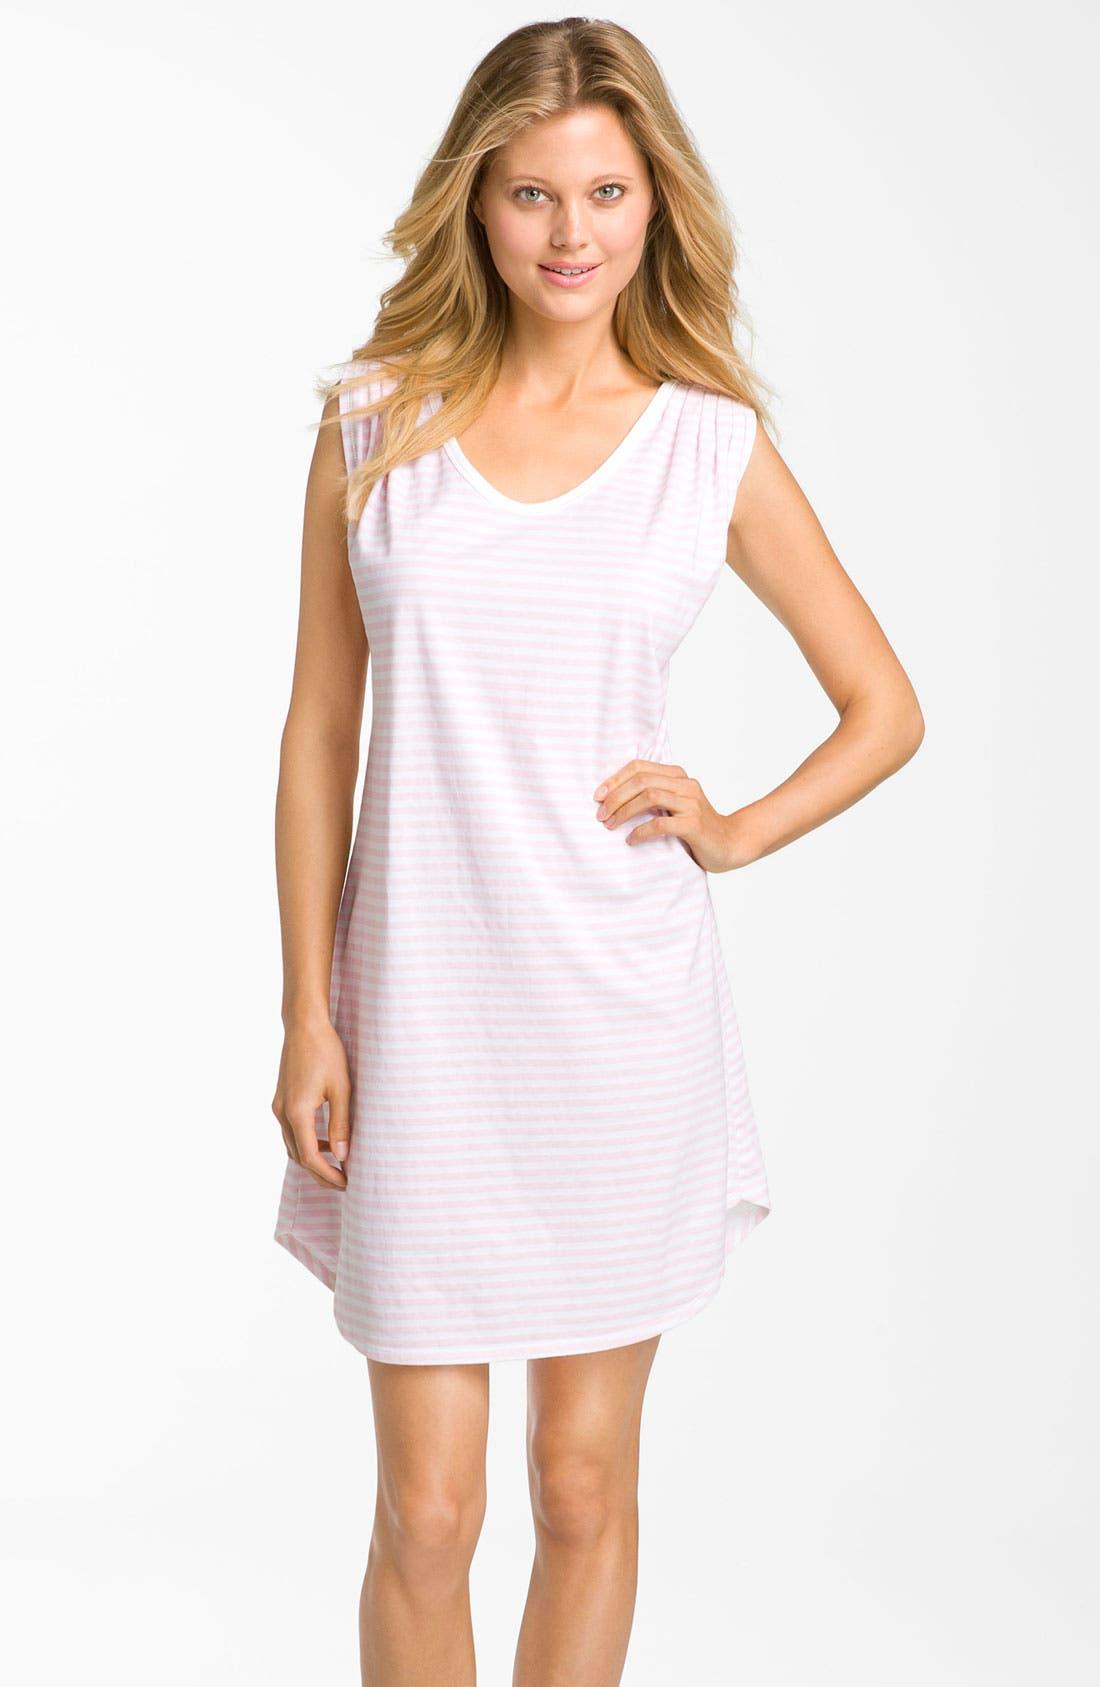 Alternate Image 1 Selected - Carole Hochman Designs 'Coastal Stripe' Sleep Shirt